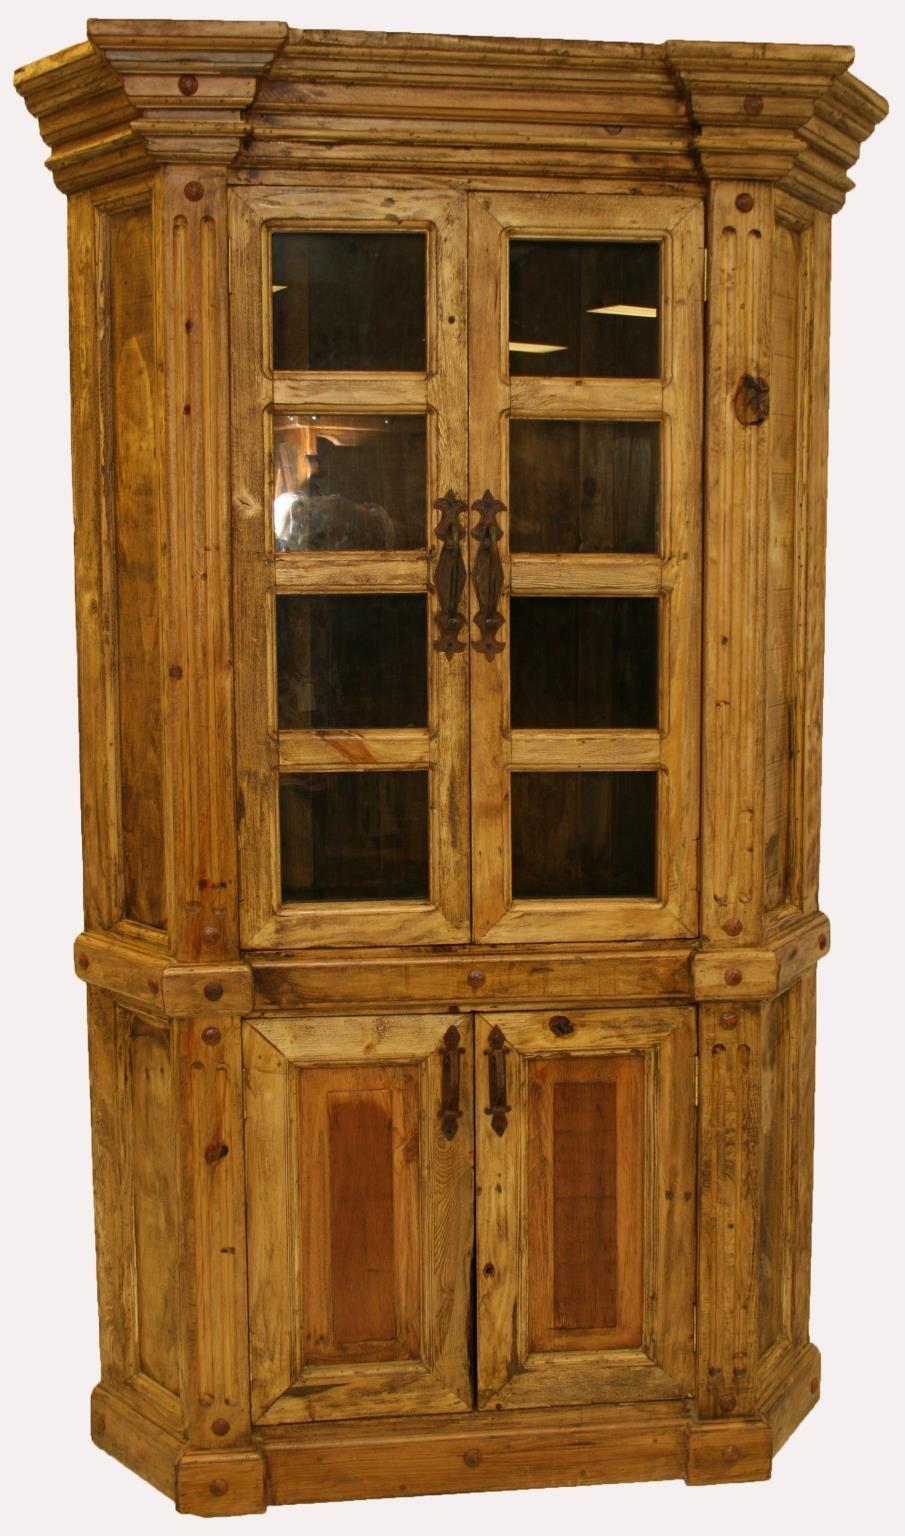 LMT Imports ZPICO-113 Corner Curio Display Cabinet at ...